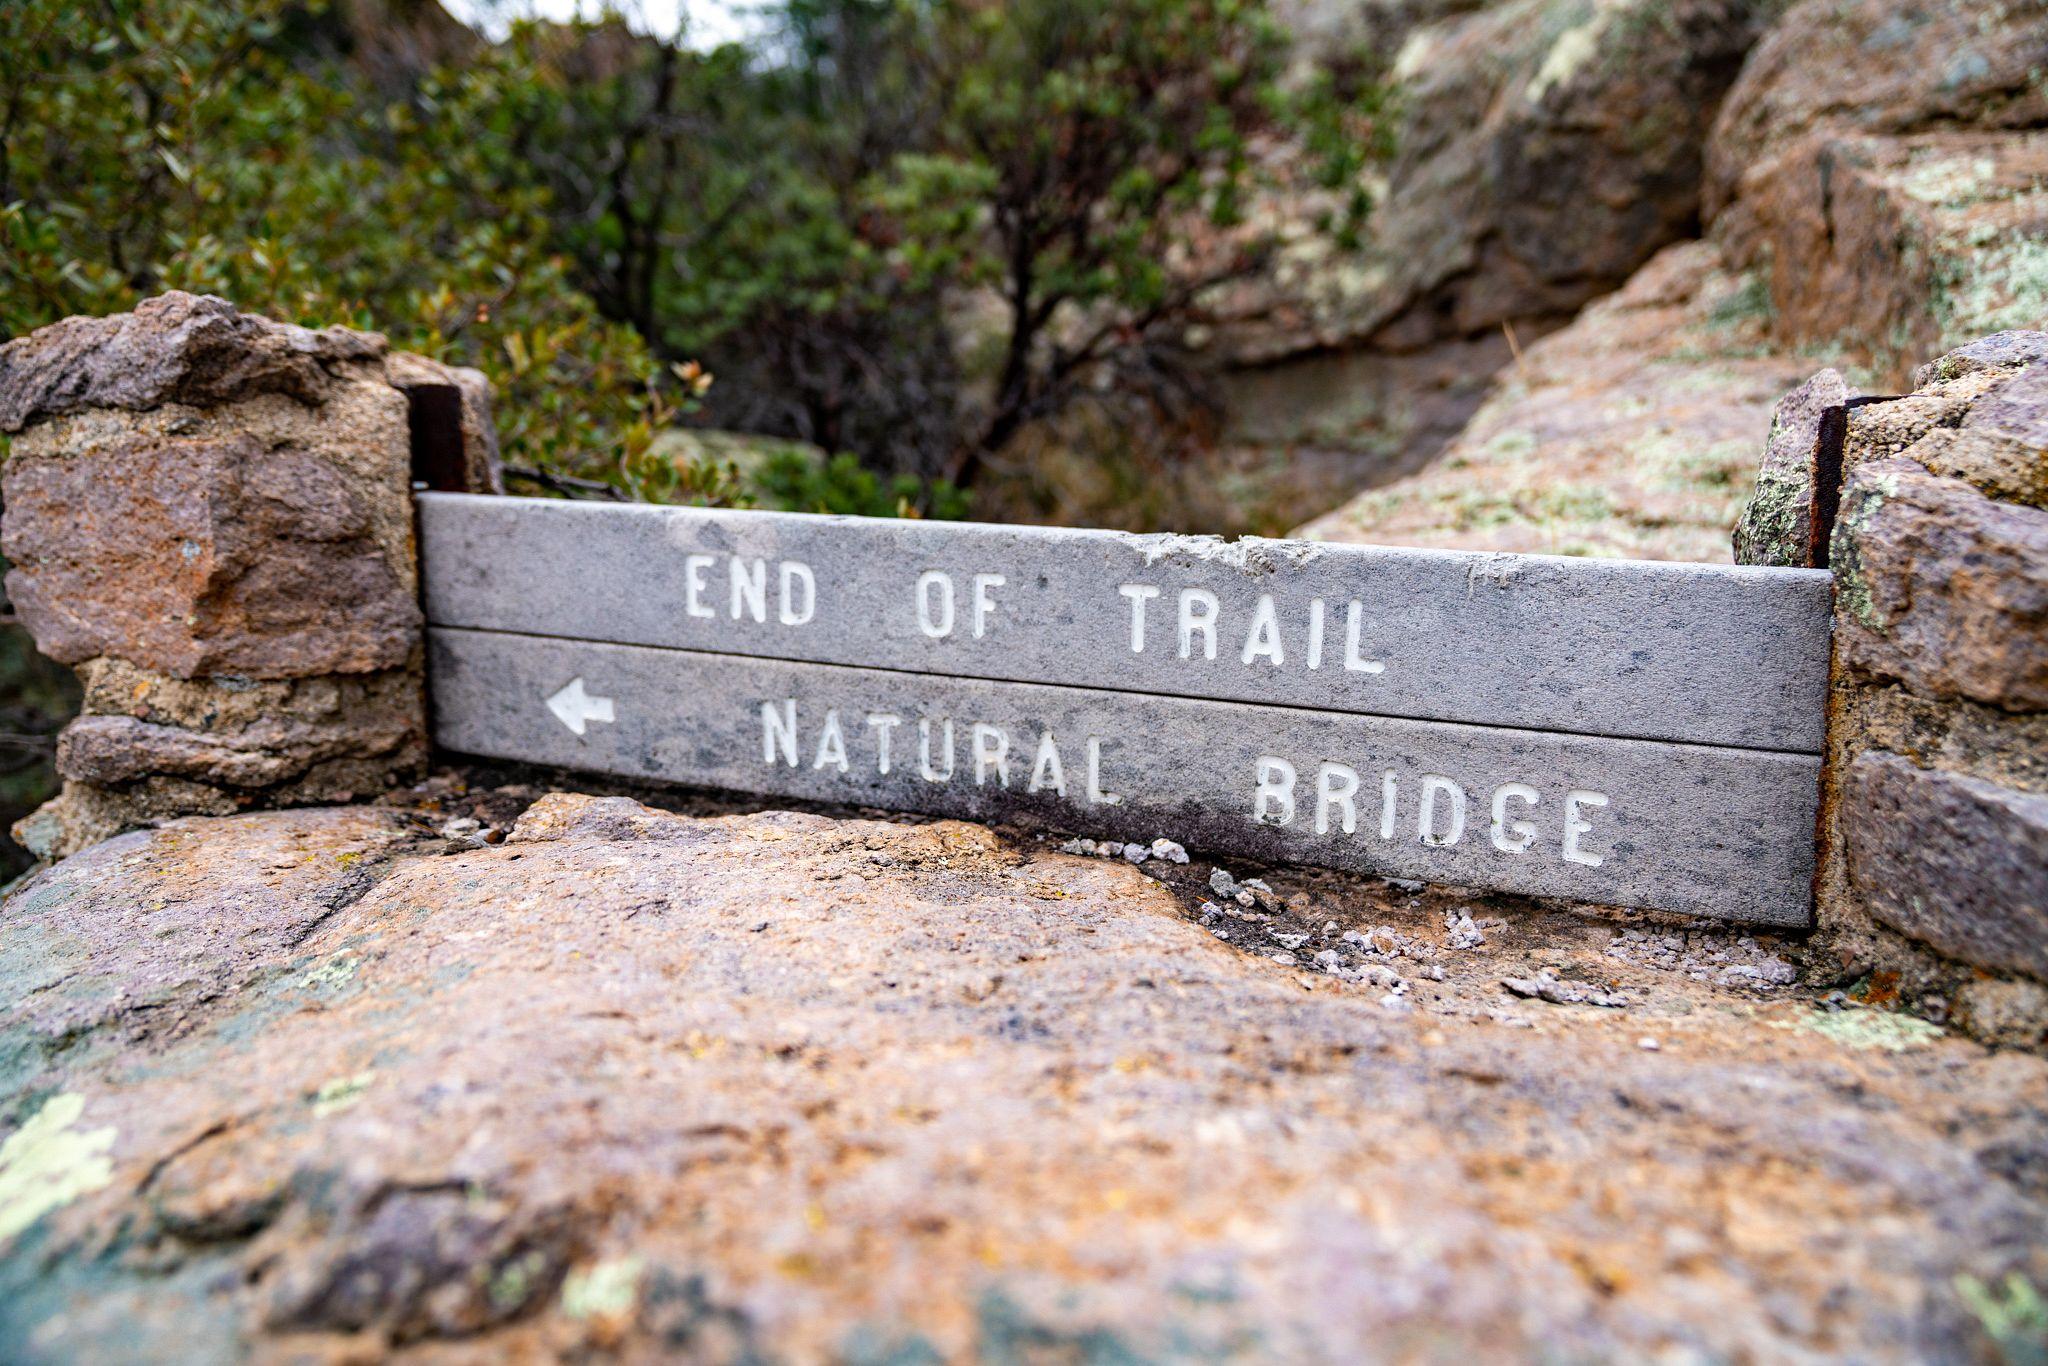 End of Trail - Natural Bridge